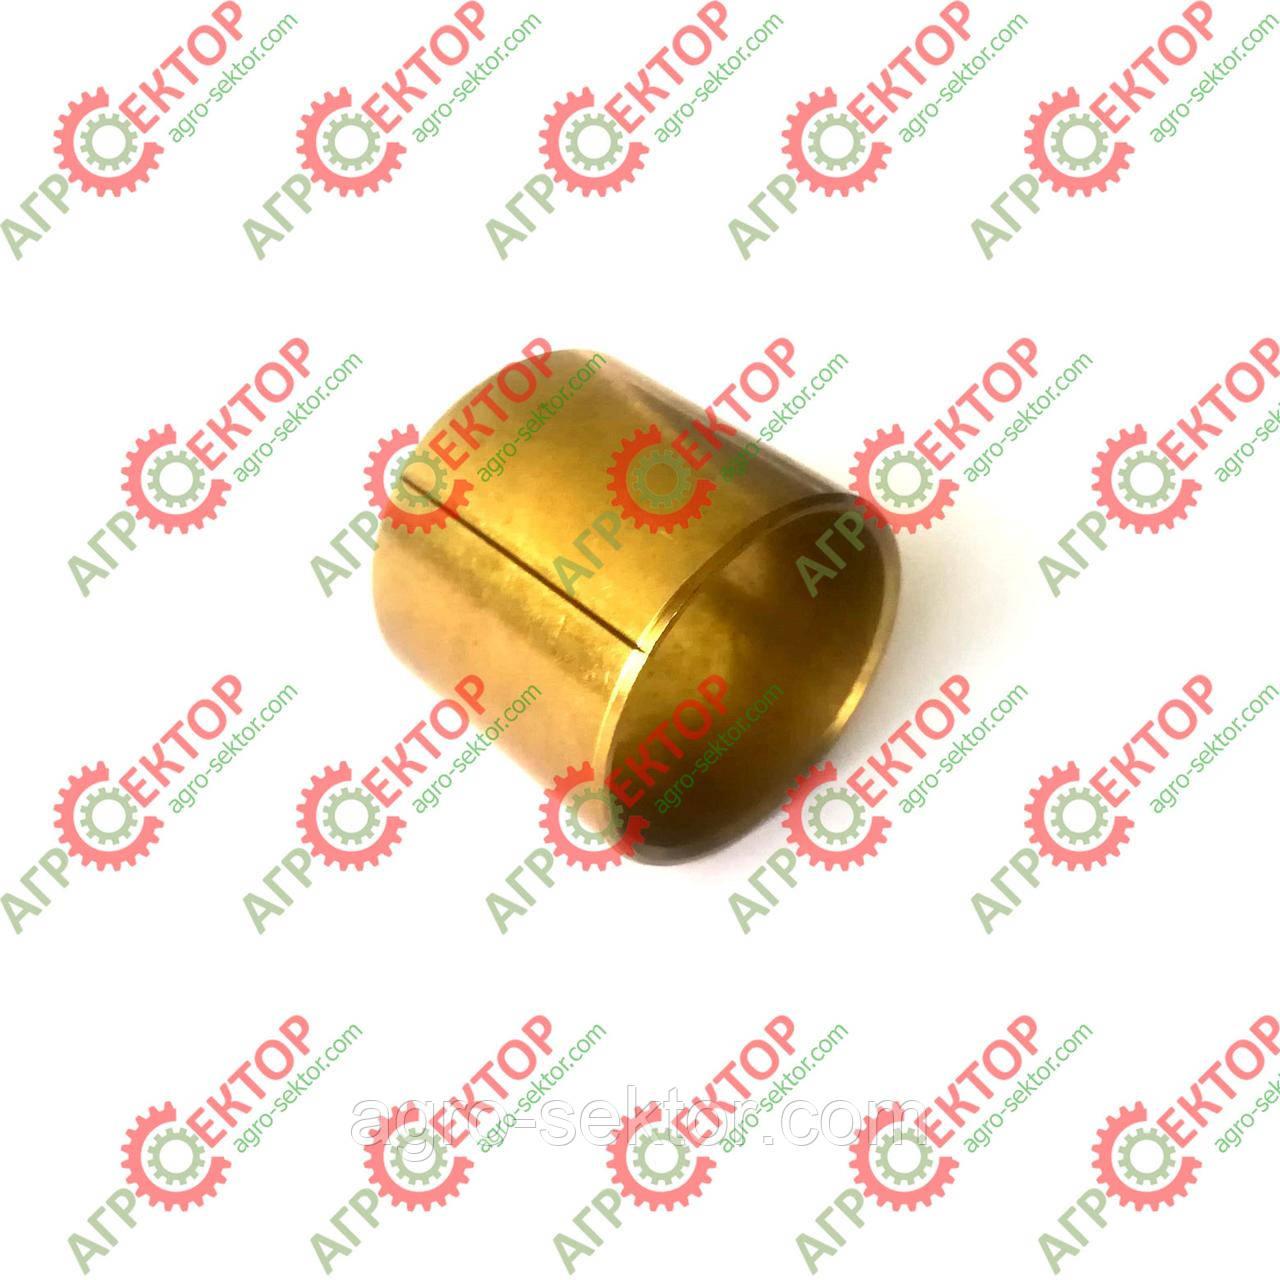 Втулка бронзова 36x40x35 маховика прес-підбирача Claas Markant 808178